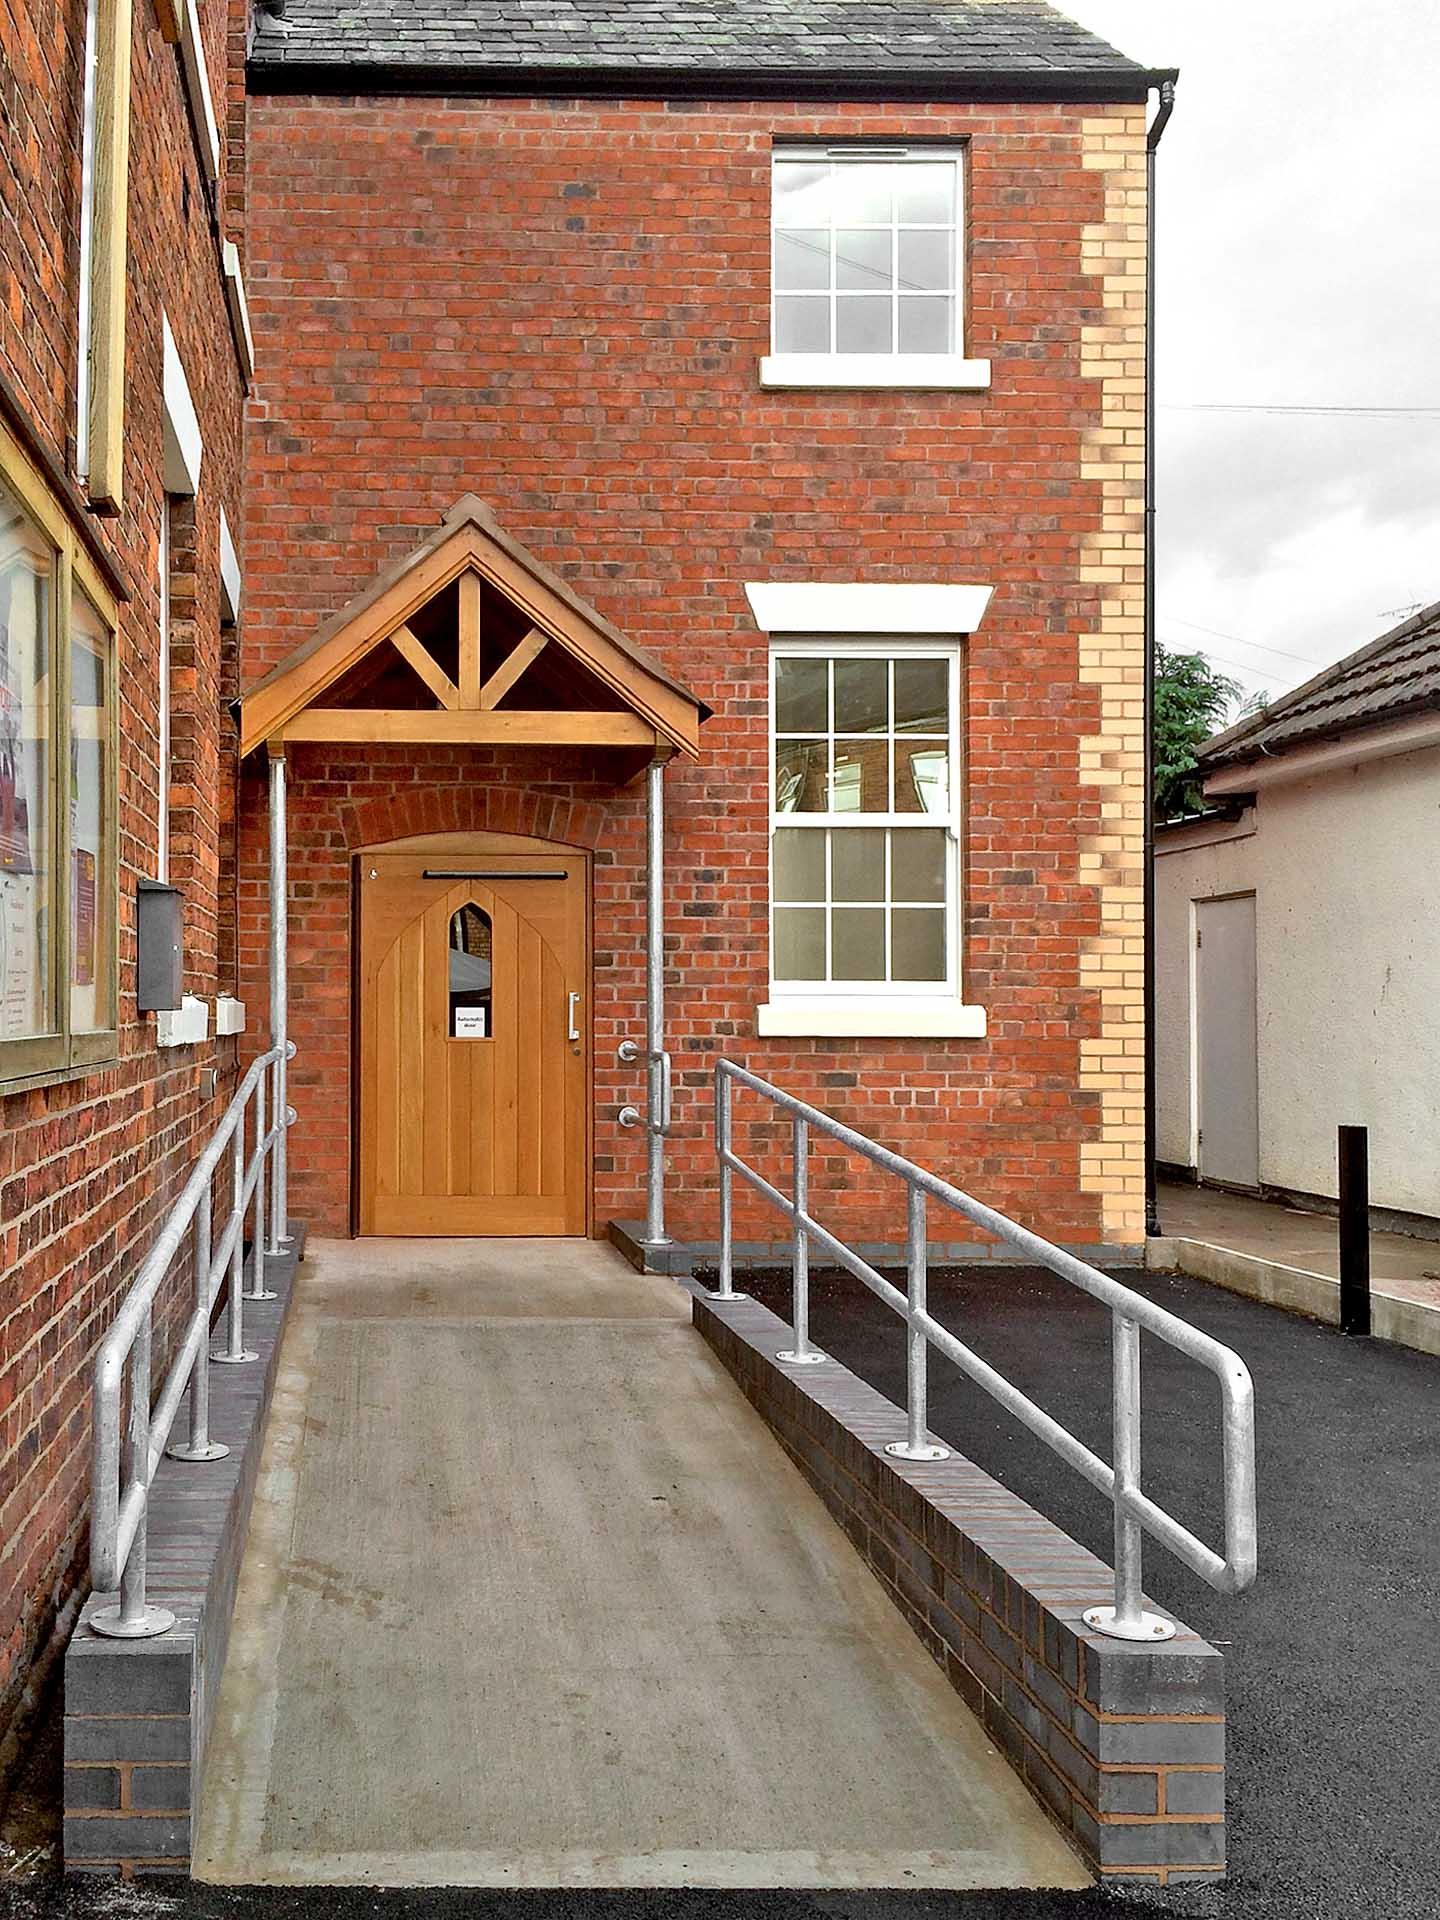 Commercial - Haslington Methodist Church